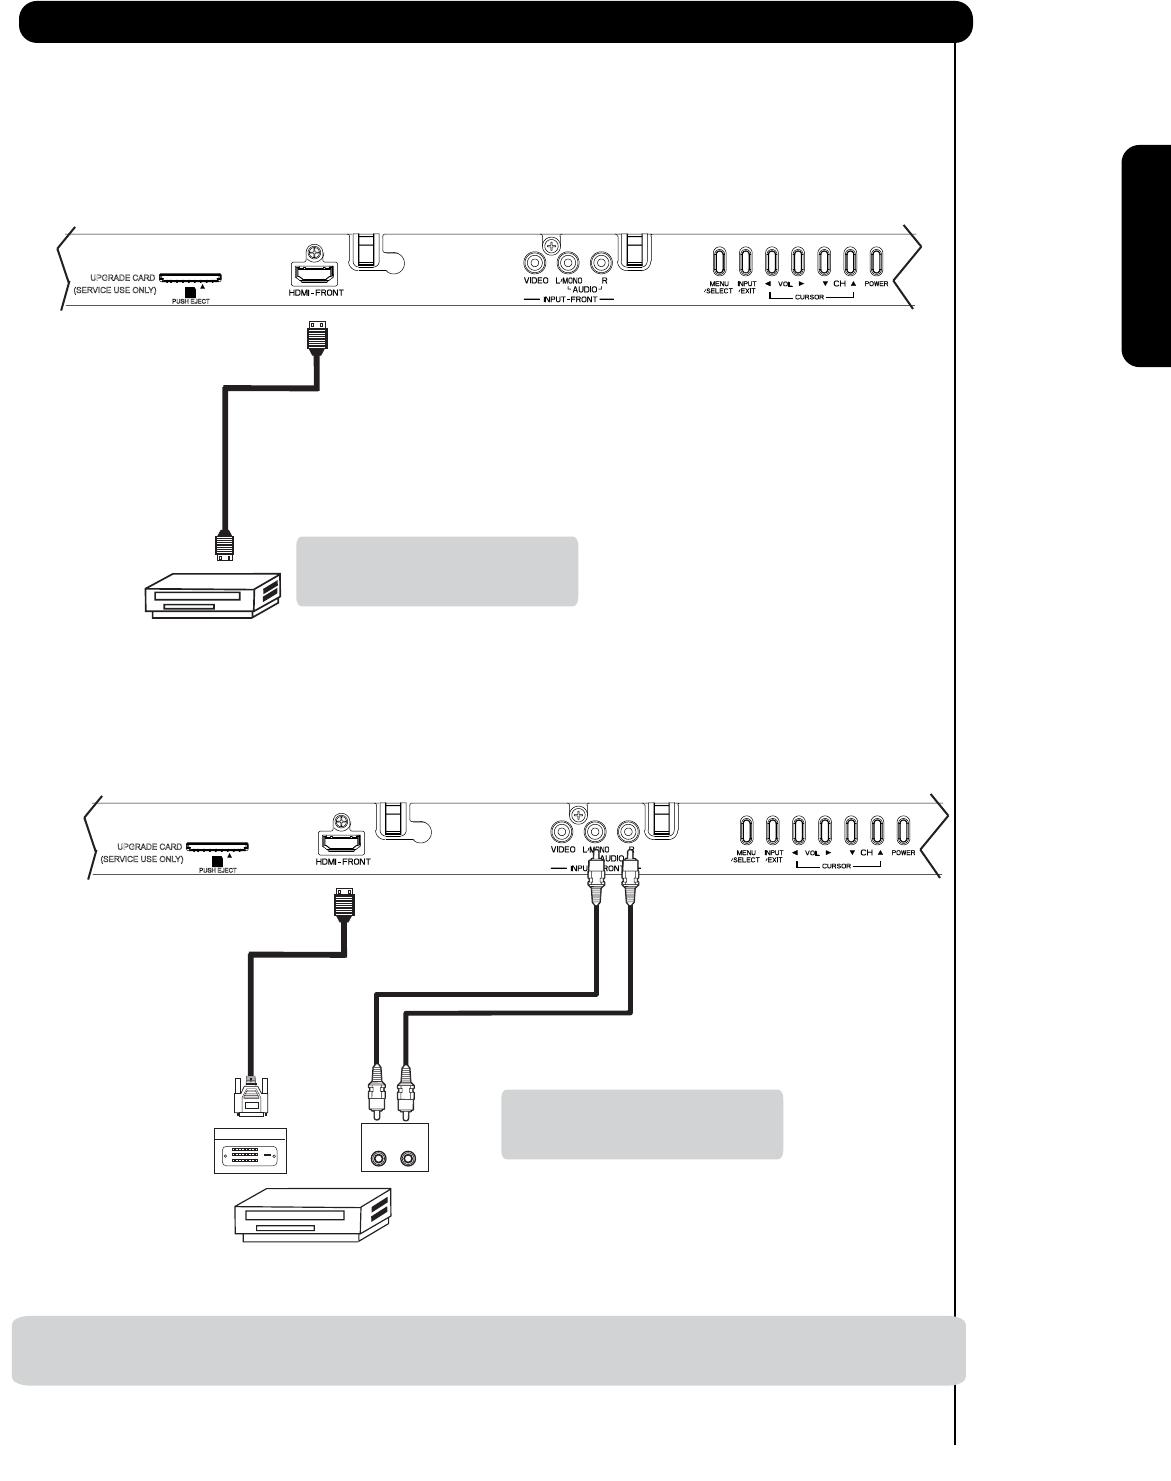 Hitachi P42h401 P42h4011 P50h401 P50h401a P55h401 Need To Connect The Audio Output Into The Front Audio Input Jacks